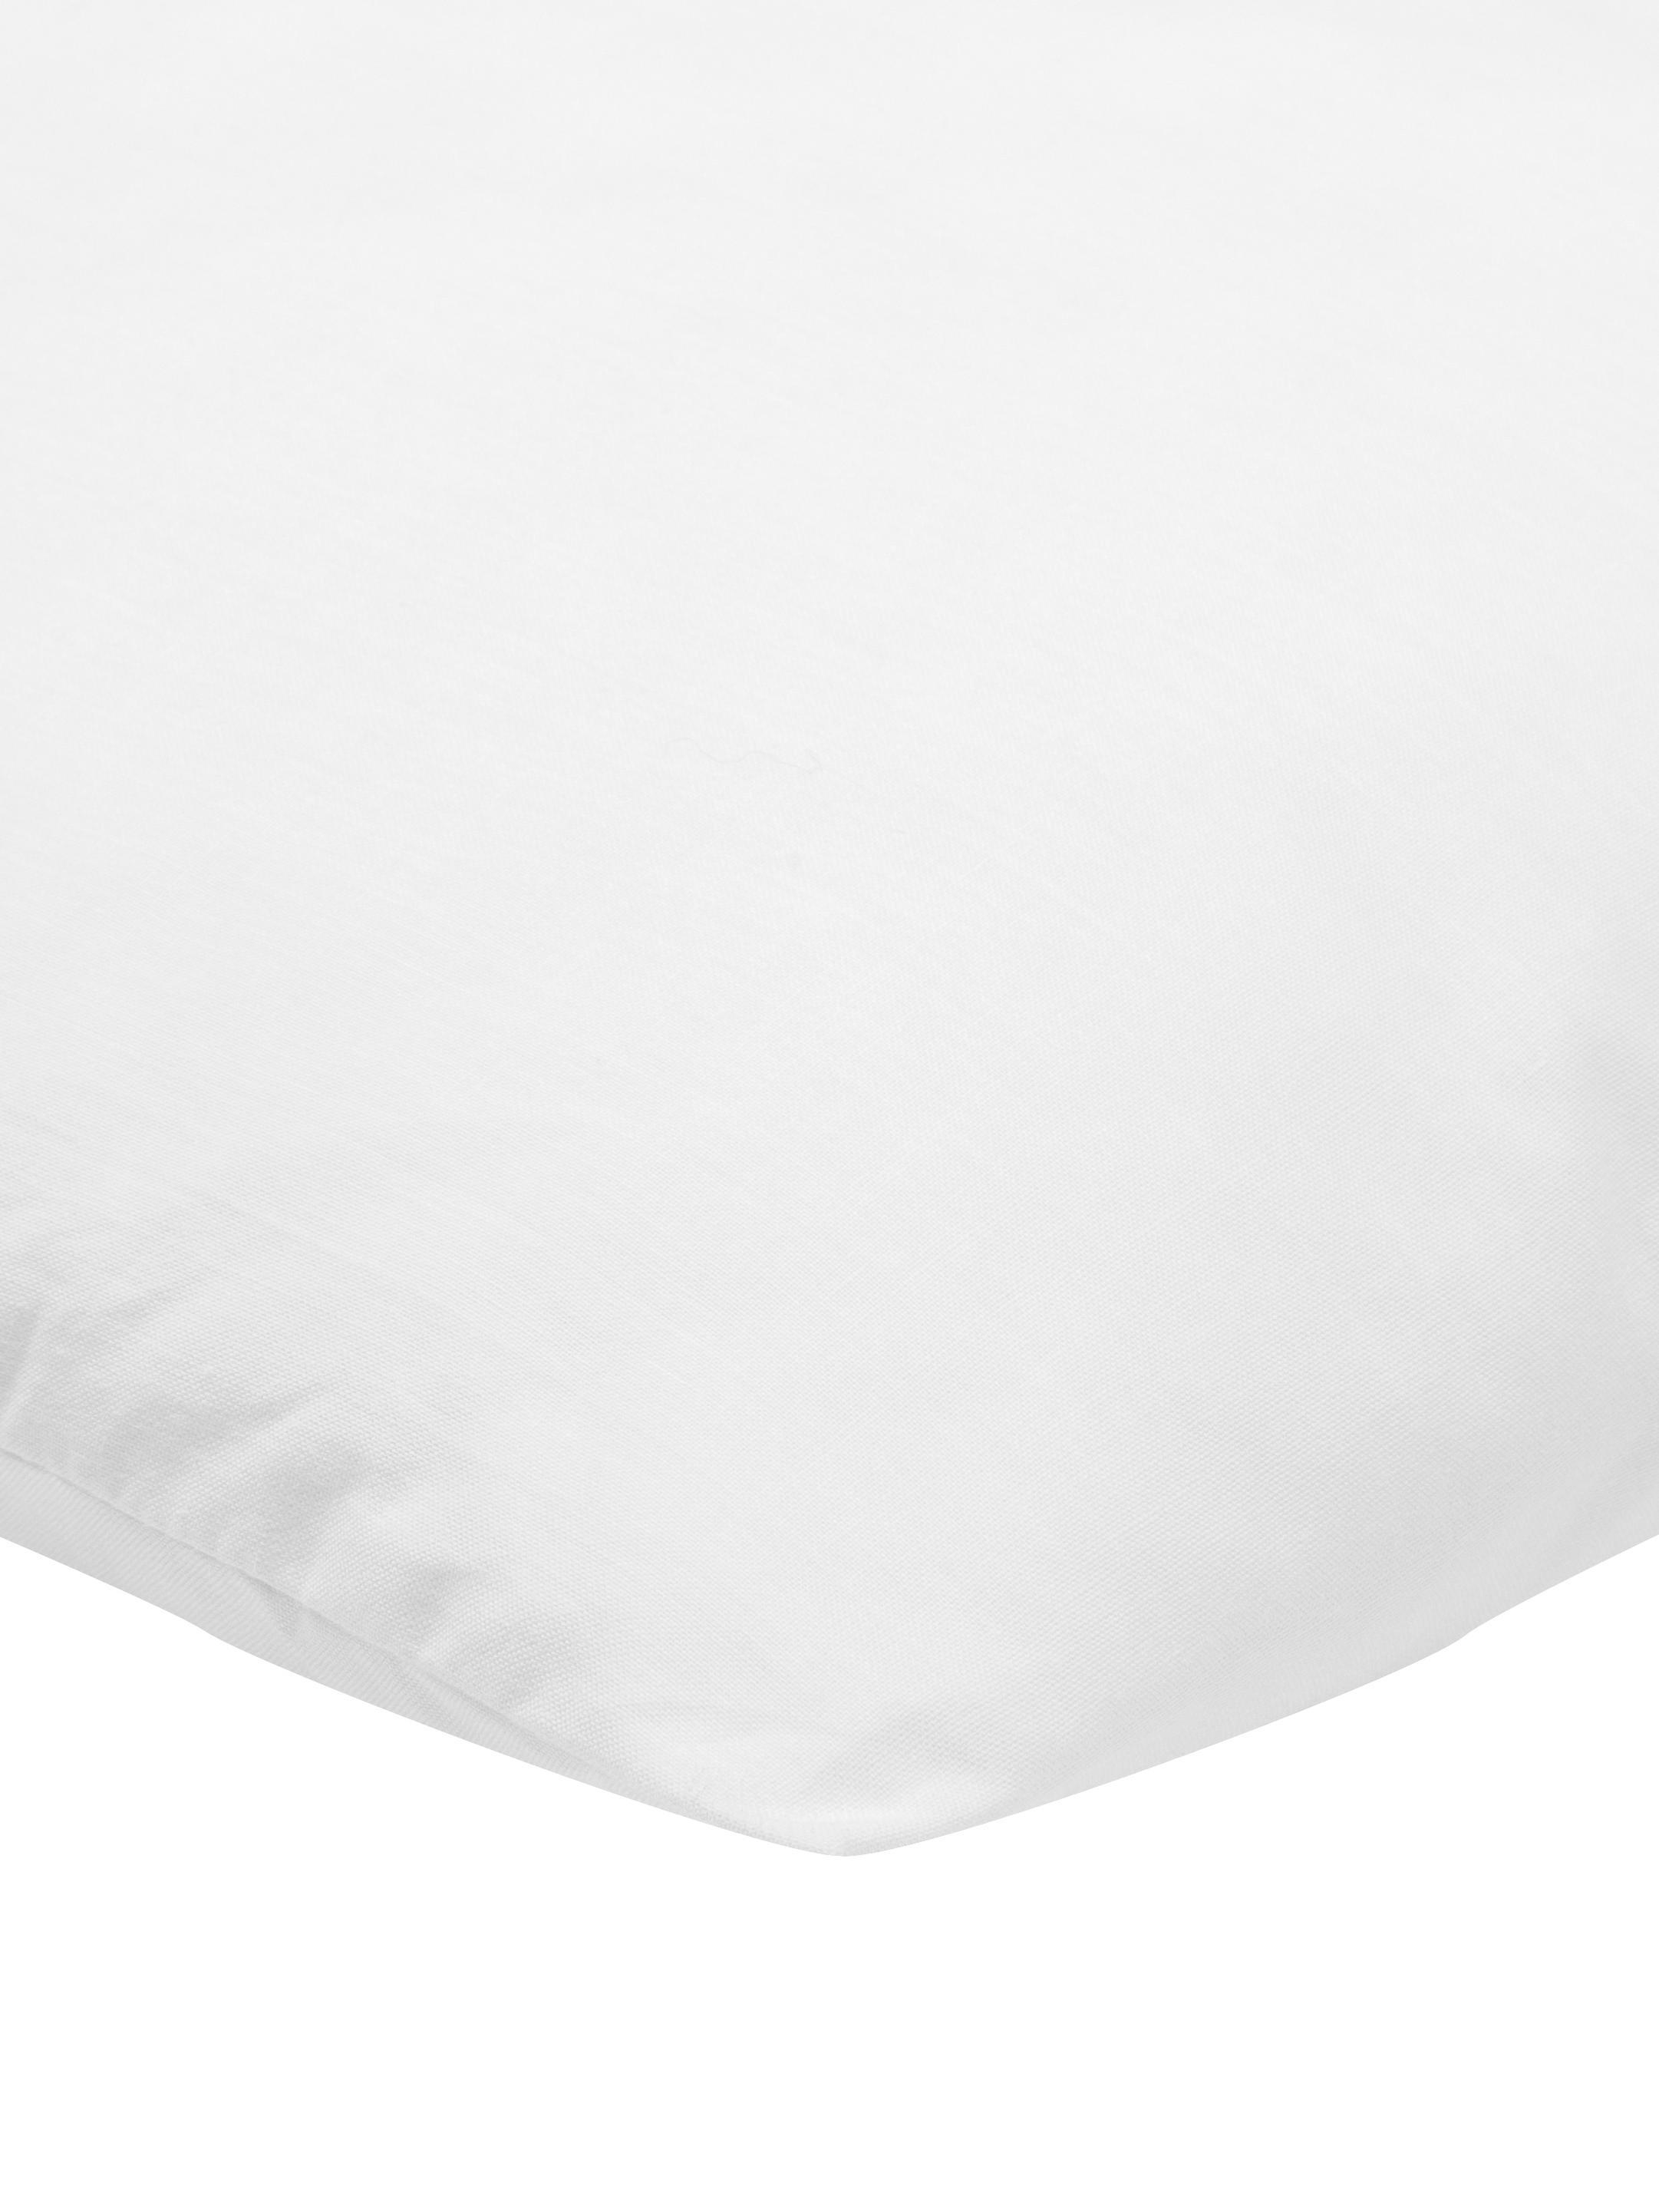 Microfiber kussenvulling Sia, 45 x 45 cm, Wit, 45 x 45 cm